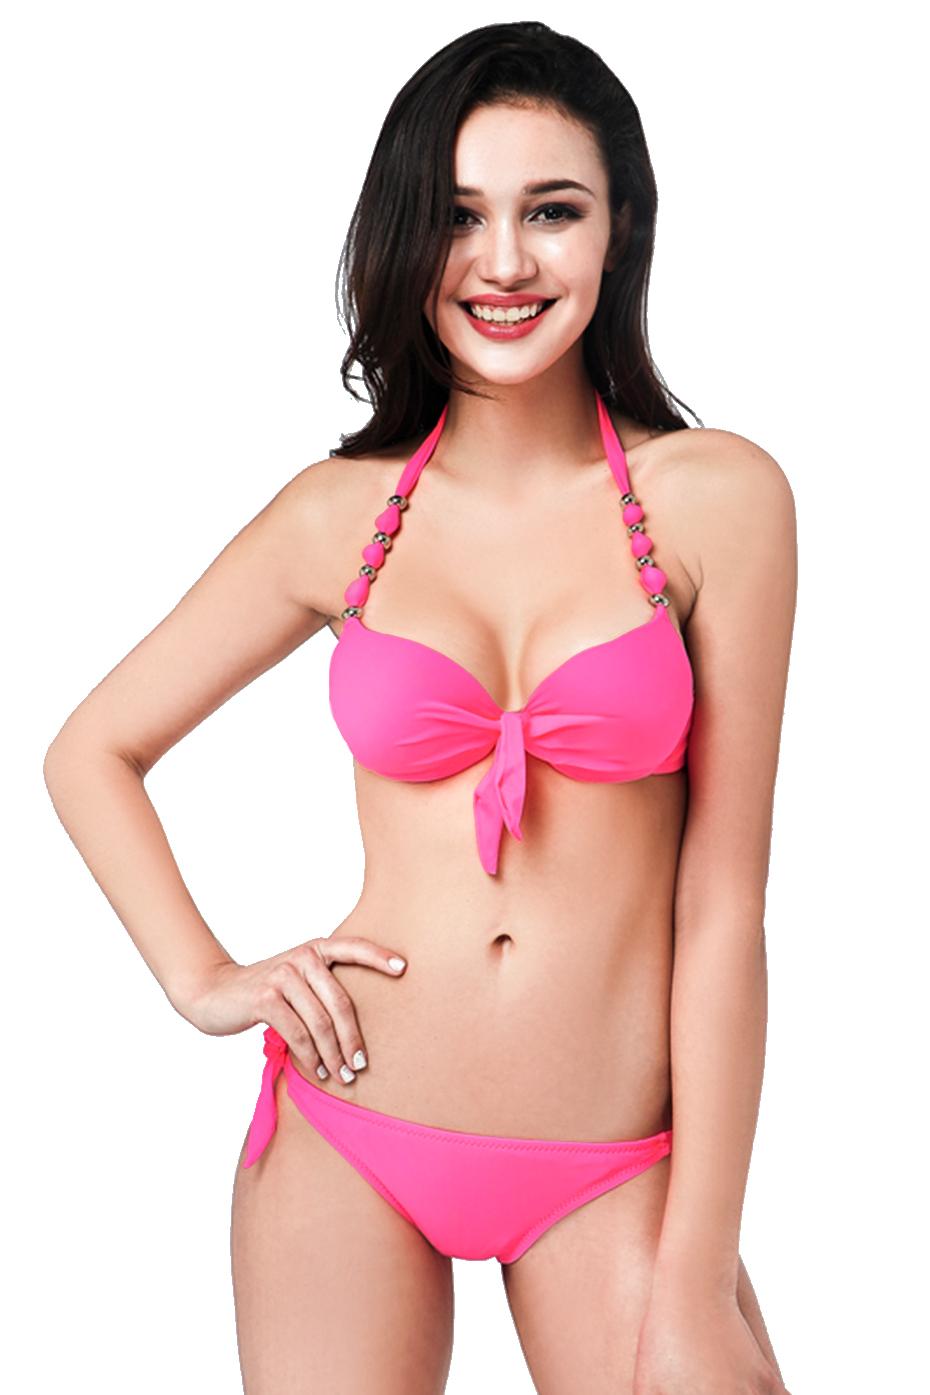 Faerdasi Halter Bikini Set Low Waist Bathing Suits Women Sexy Push Up Beachwear with Tie Side and Center Bow Swimwear Swimsuit 33